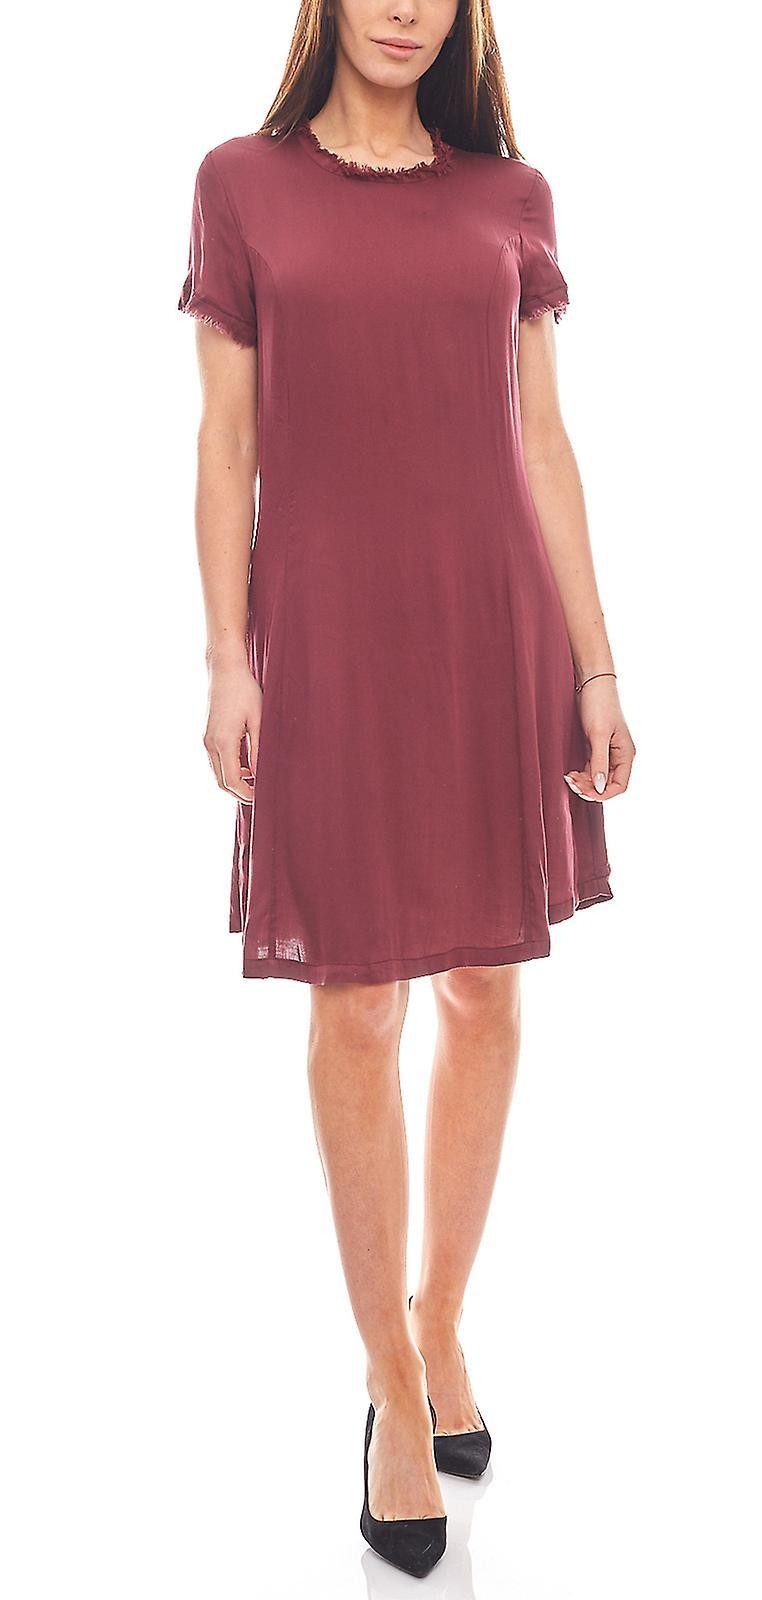 15 Luxus Bordeaux Kleid Bester Preis20 Einzigartig Bordeaux Kleid Bester Preis